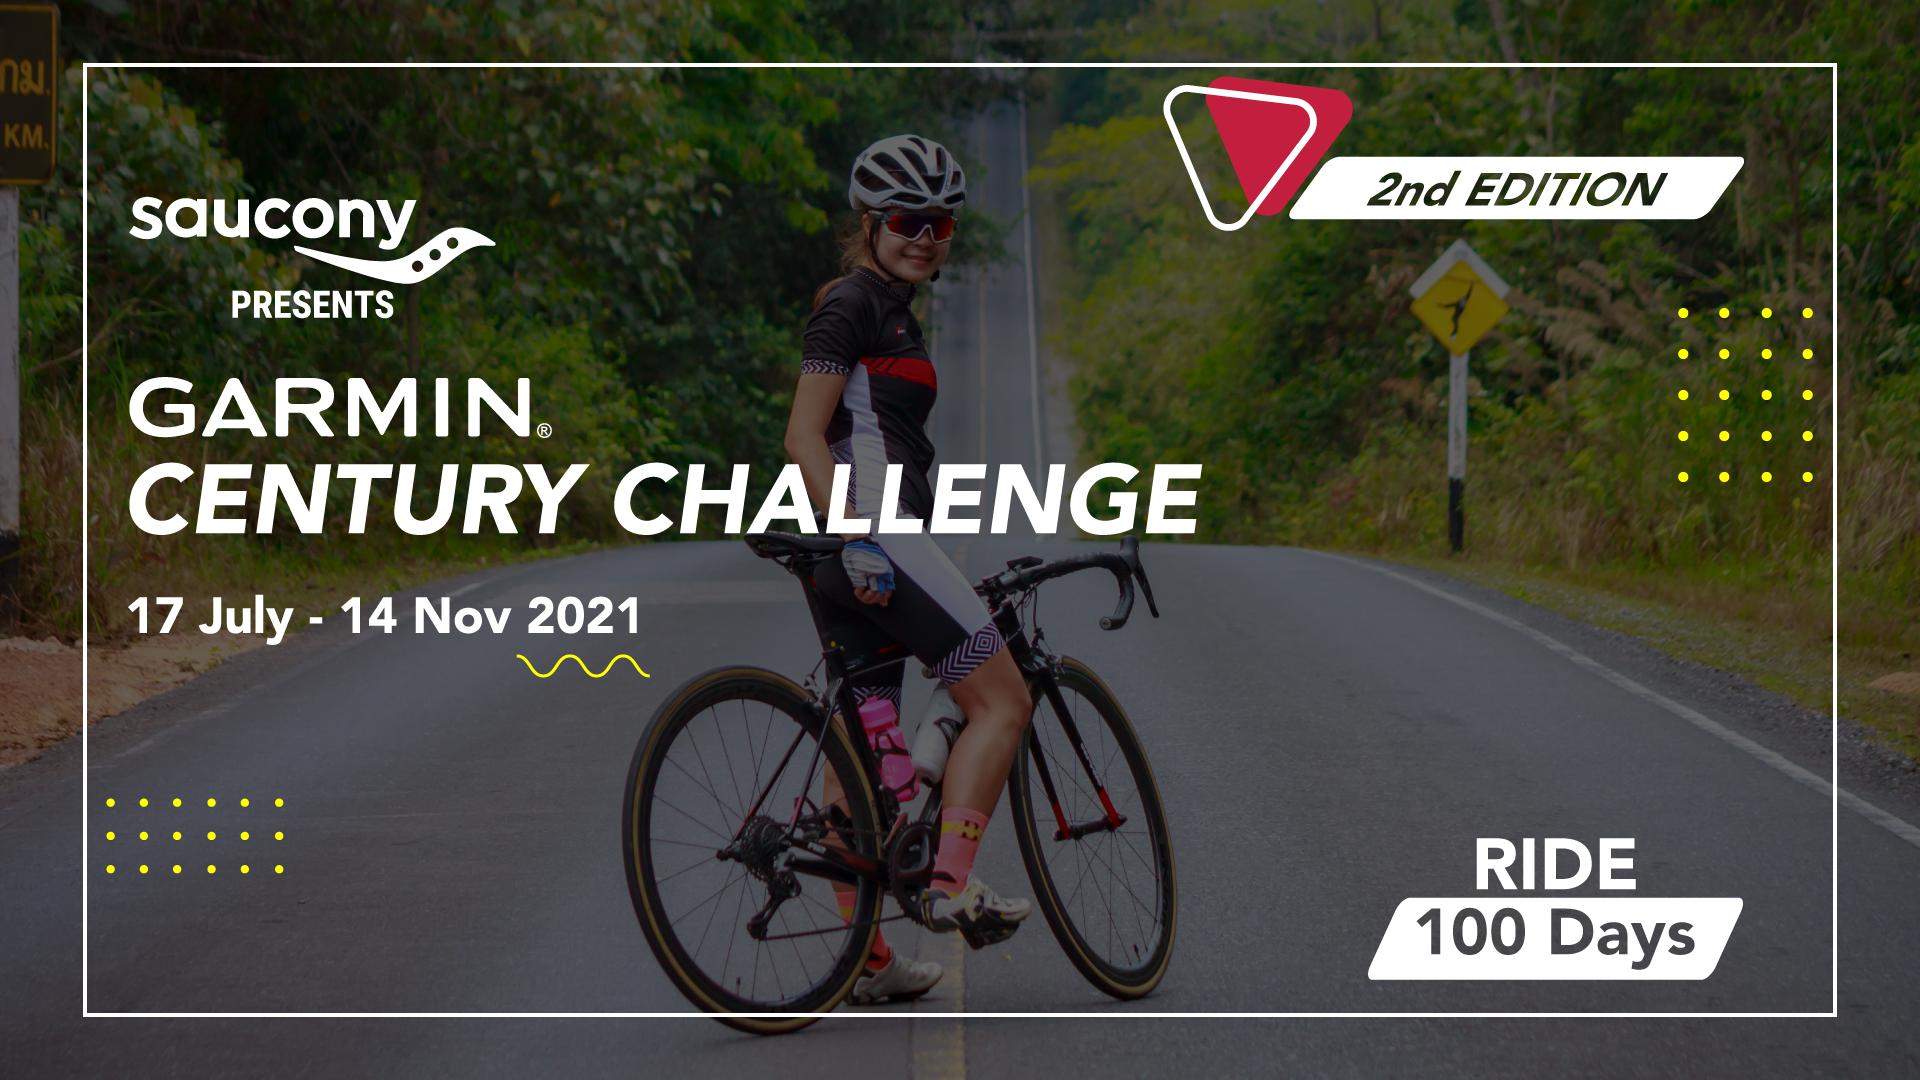 Garmin Century Challenge 2021 image